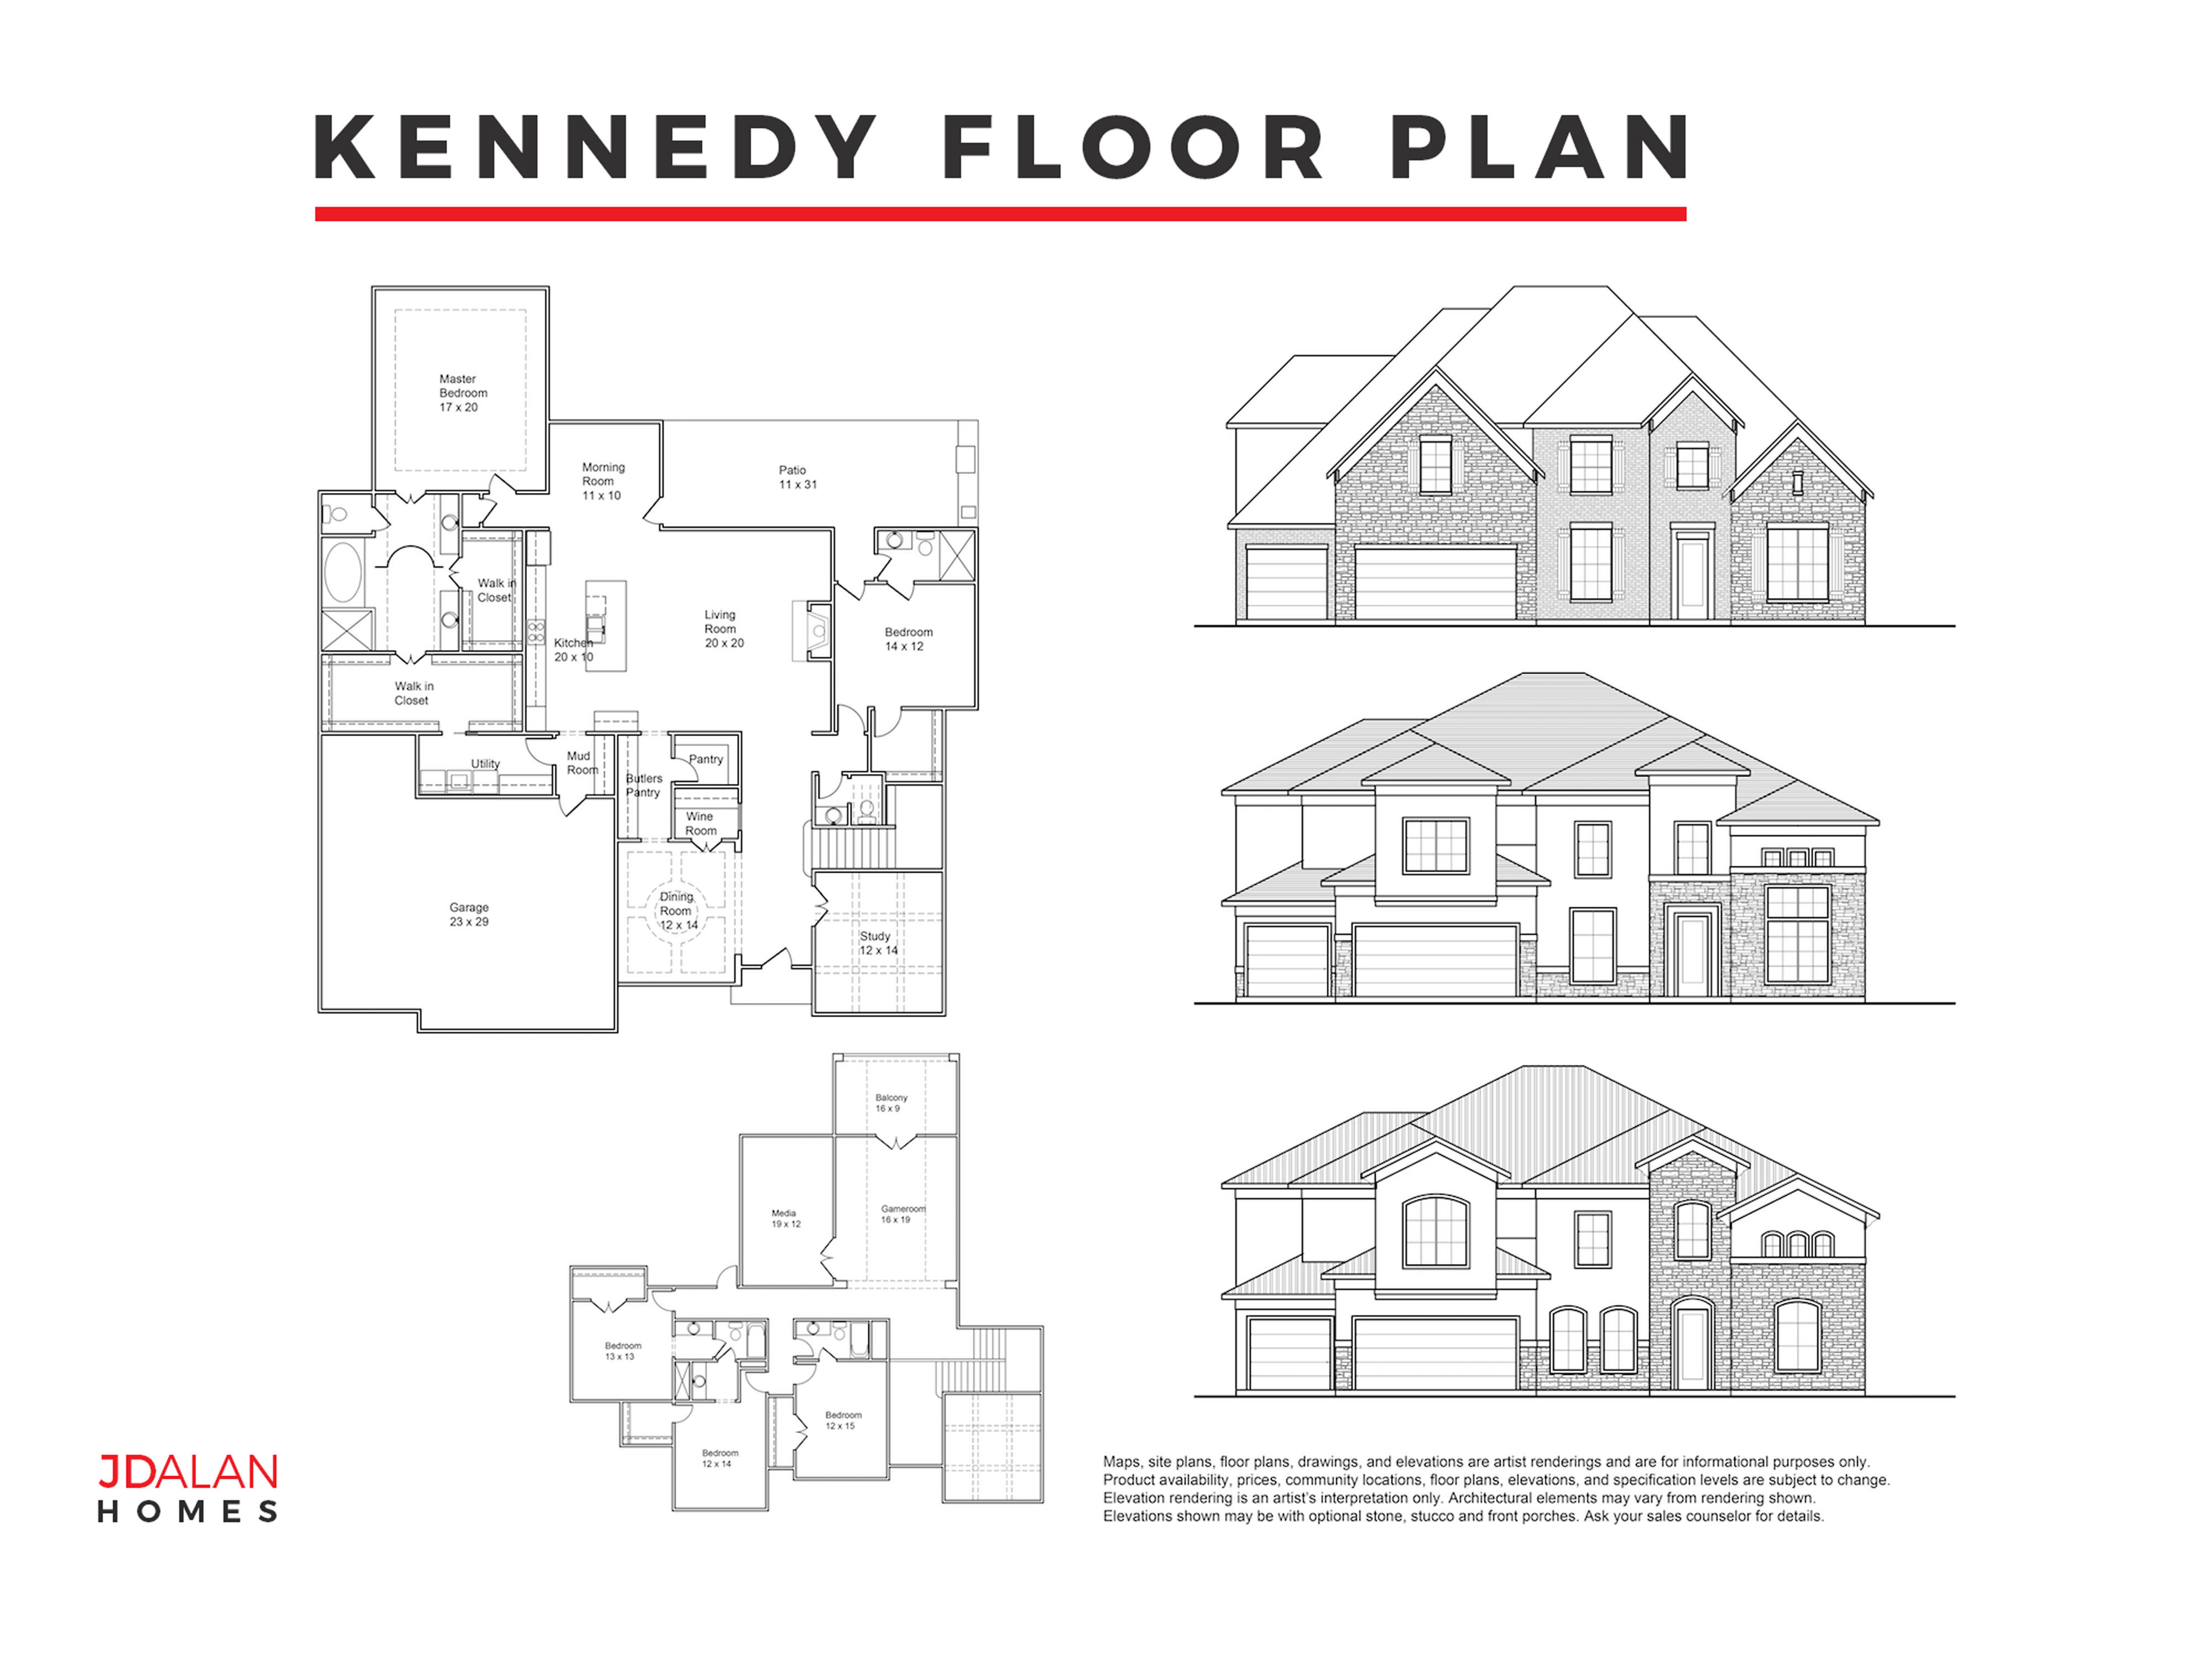 KENNEDY FLOOR PLAN #4539